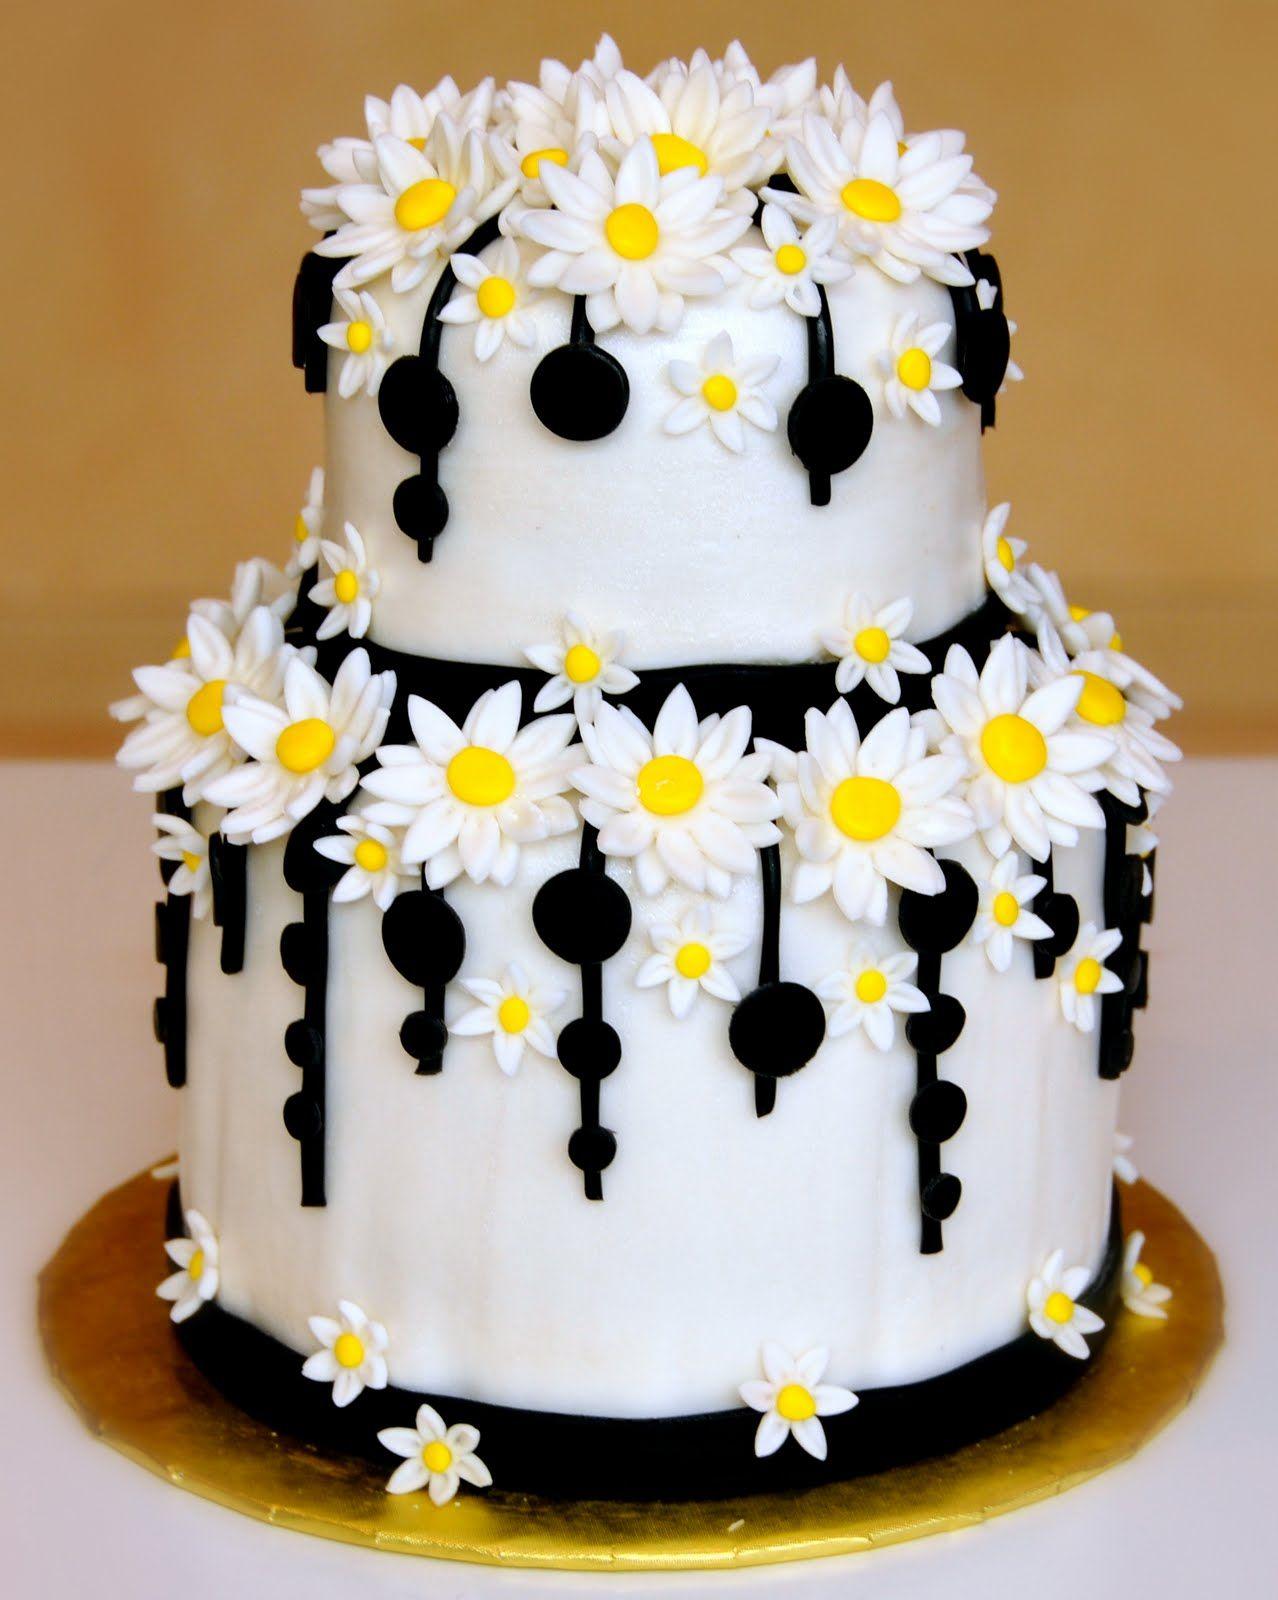 Strange Happy Birthday Joann Cake Happy Birthday Joann Birthday Cake Funny Birthday Cards Online Elaedamsfinfo